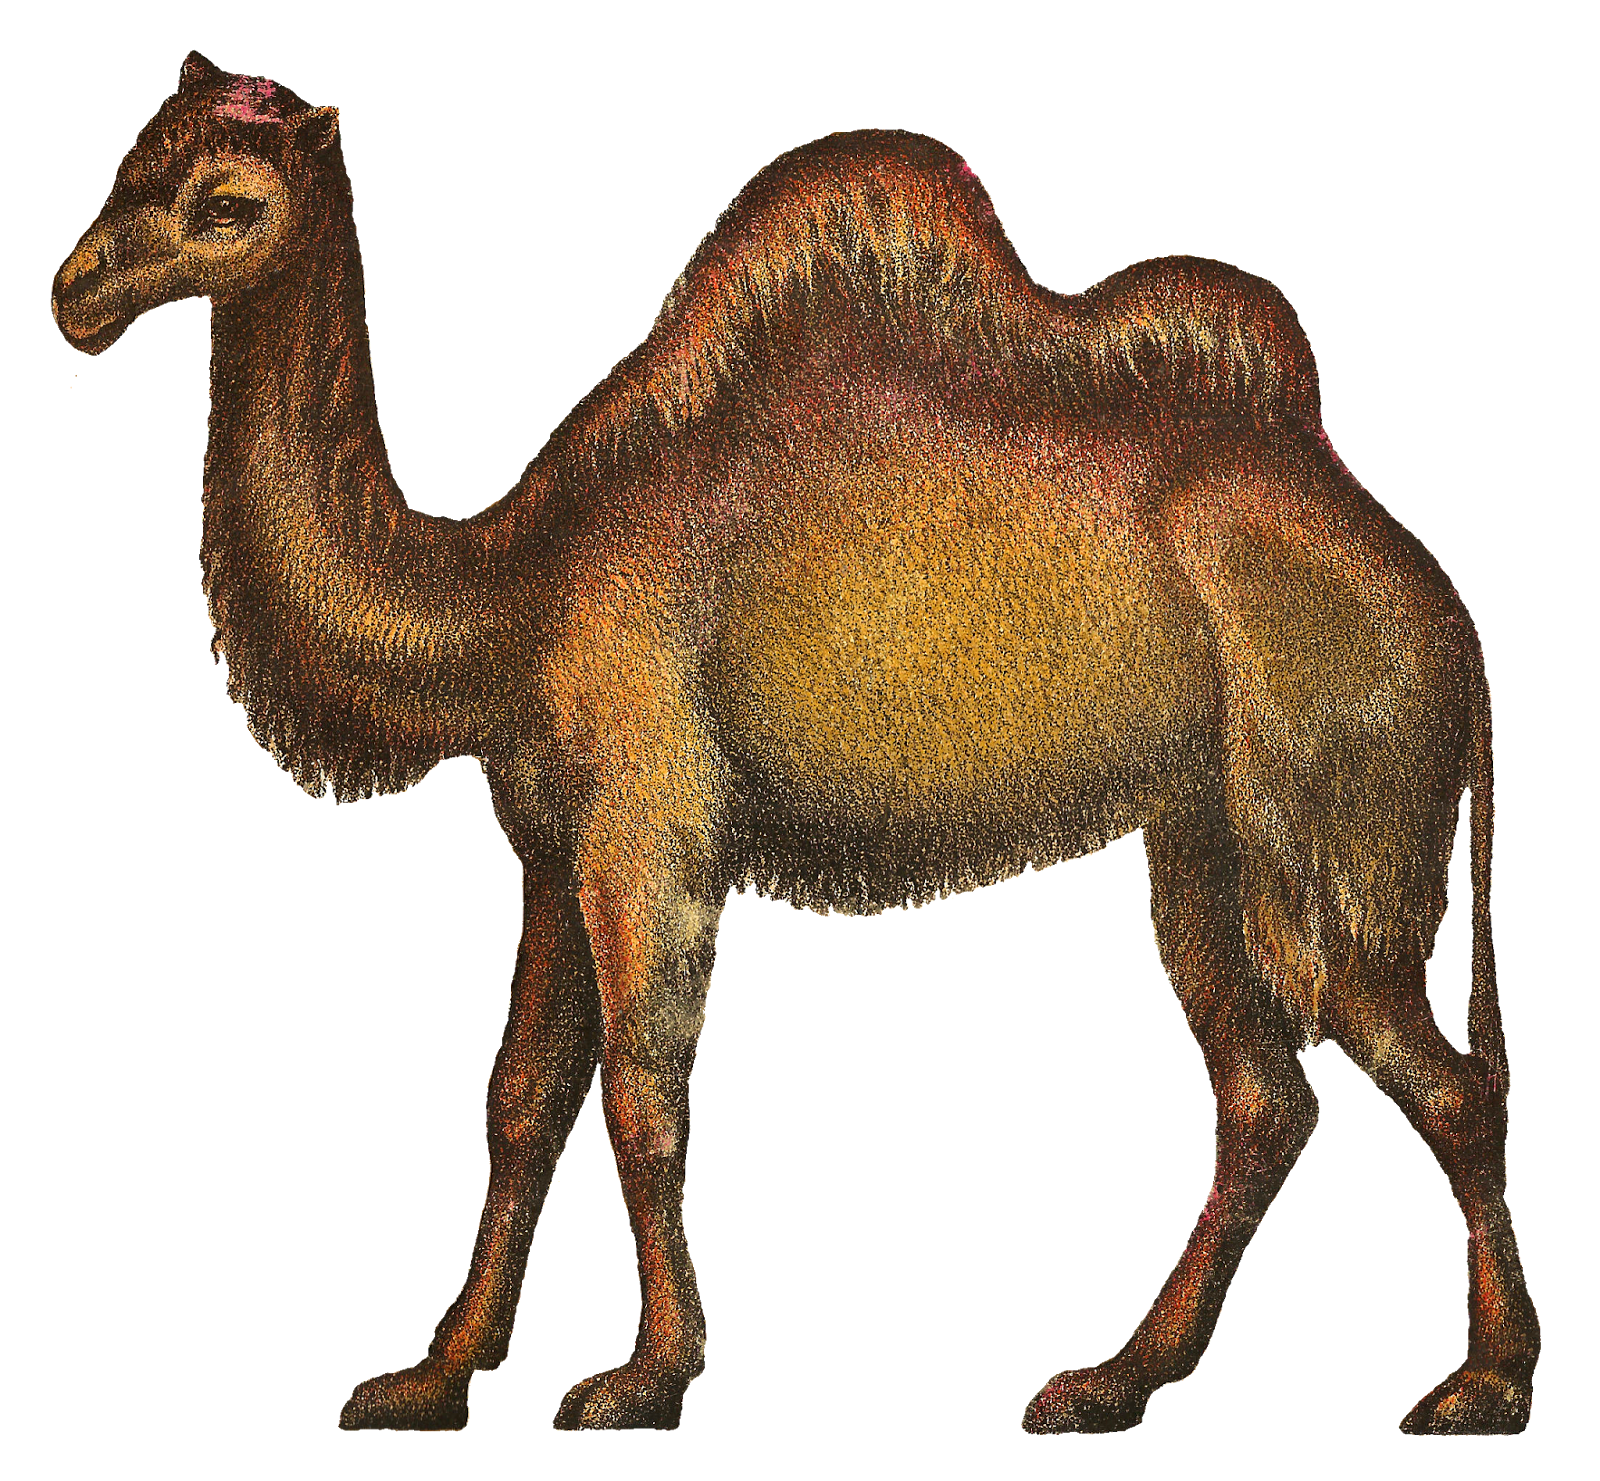 https://3.bp.blogspot.com/-O74fdB6WhoU/V6ekcIR63AI/AAAAAAAAc6E/xt4uNVktTsE4wbljq-F02IkXwkrPx1NXwCLcB/s1600/camel-circus-image-antique-illustration-png.png Circus Animals Png